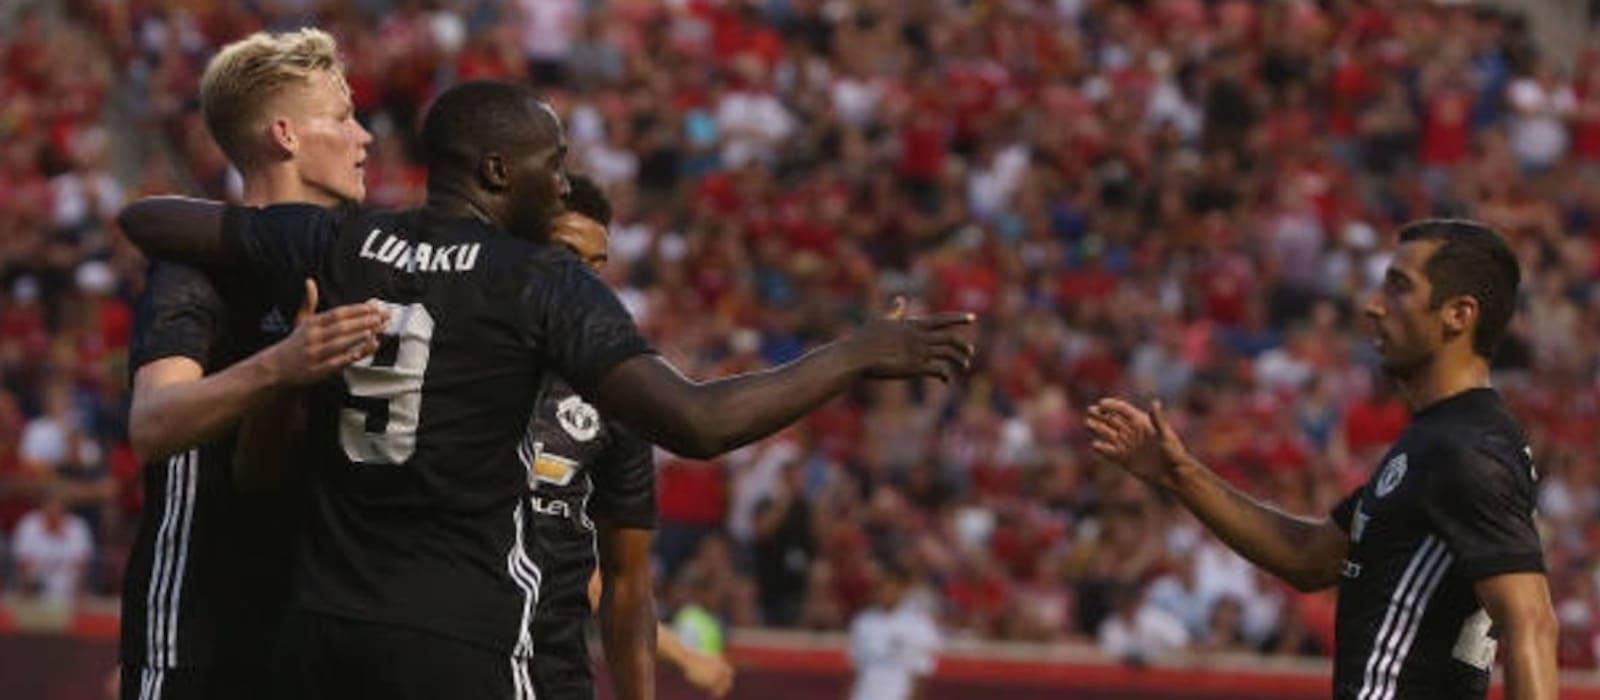 Ander Herrera reacts to Romelu Lukaku's goal against Real Salt Lake City